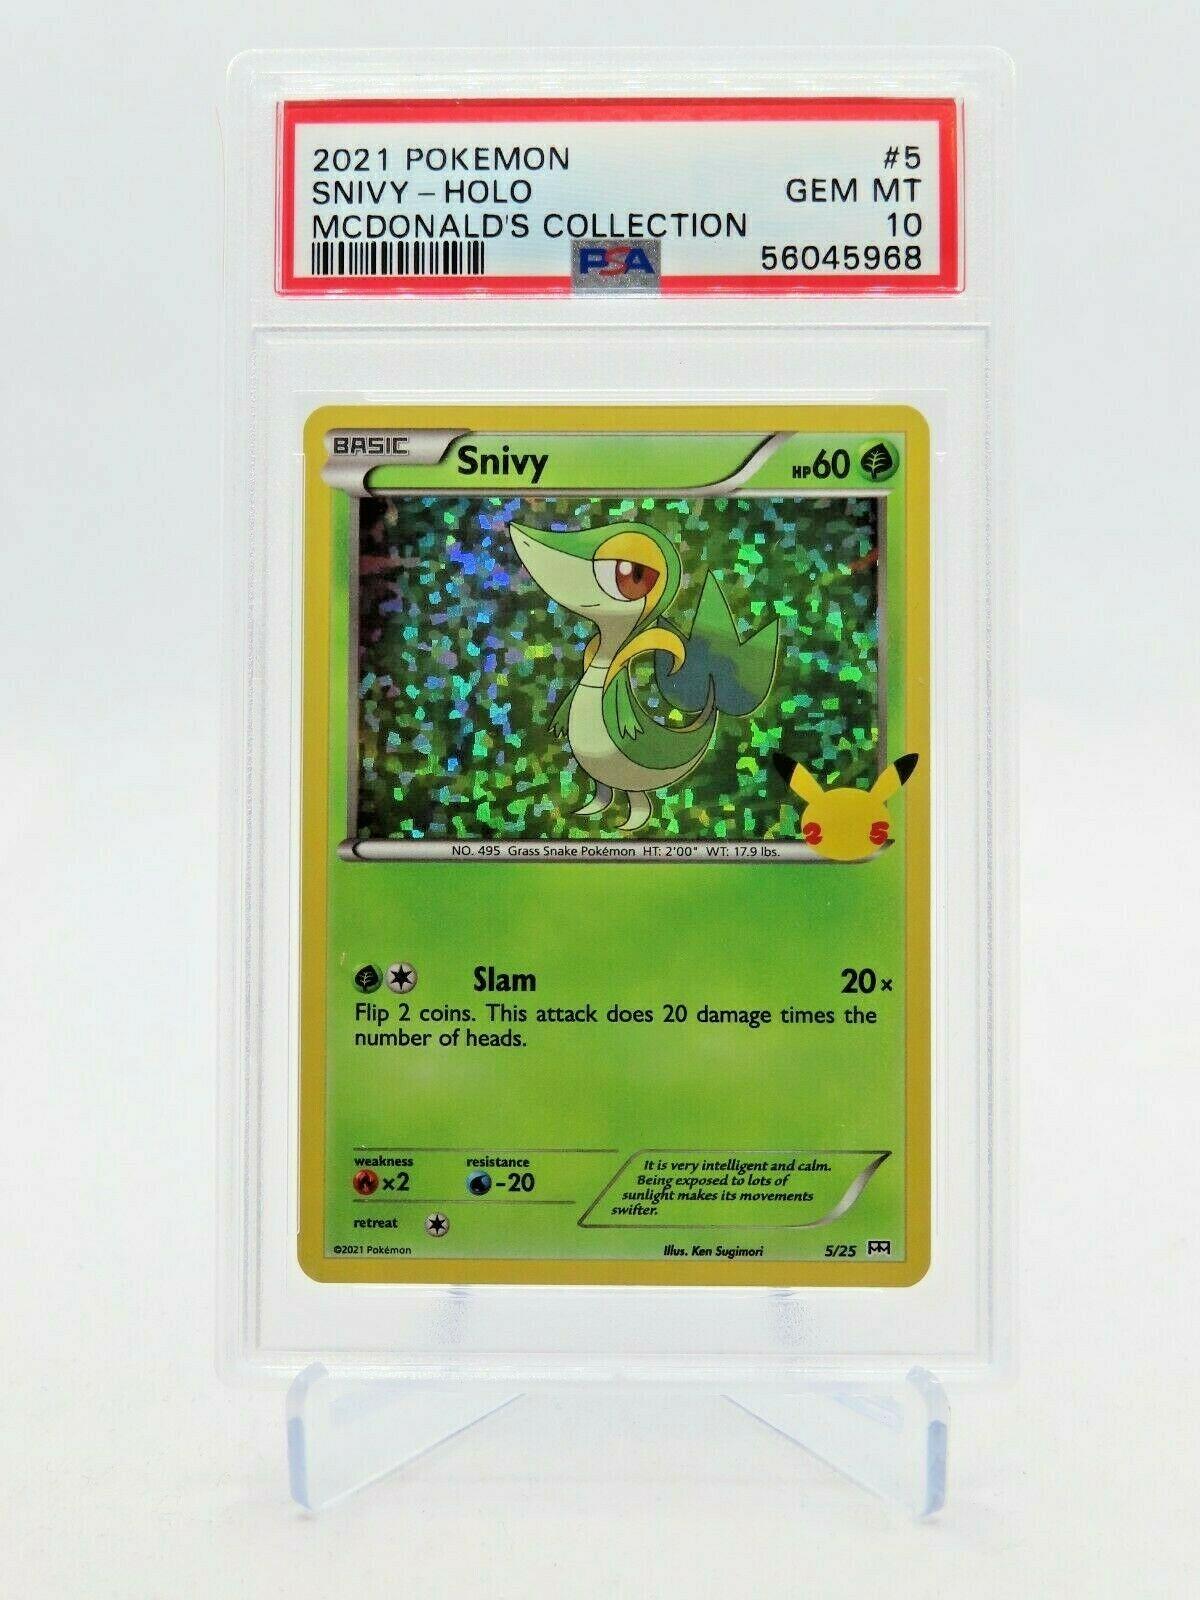 2021 Pokemon McDonald's 25th Anniversary Snivy 5/25 Holo GEM MINT PSA 10